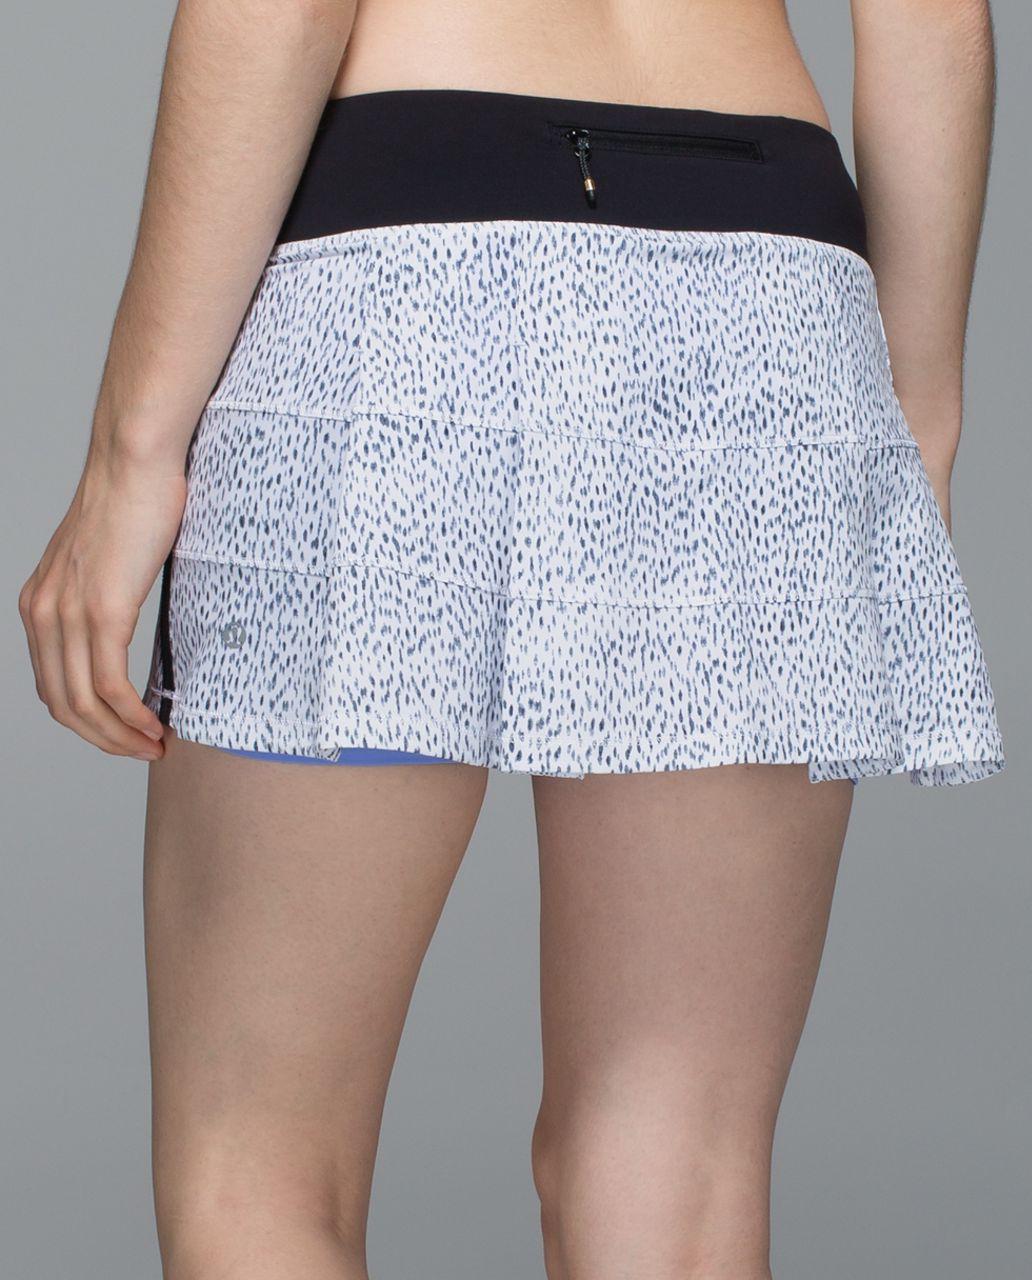 Lululemon Pace Rival Skirt II *4-way Stretch (Regular) - Dottie Dash White Black / Black